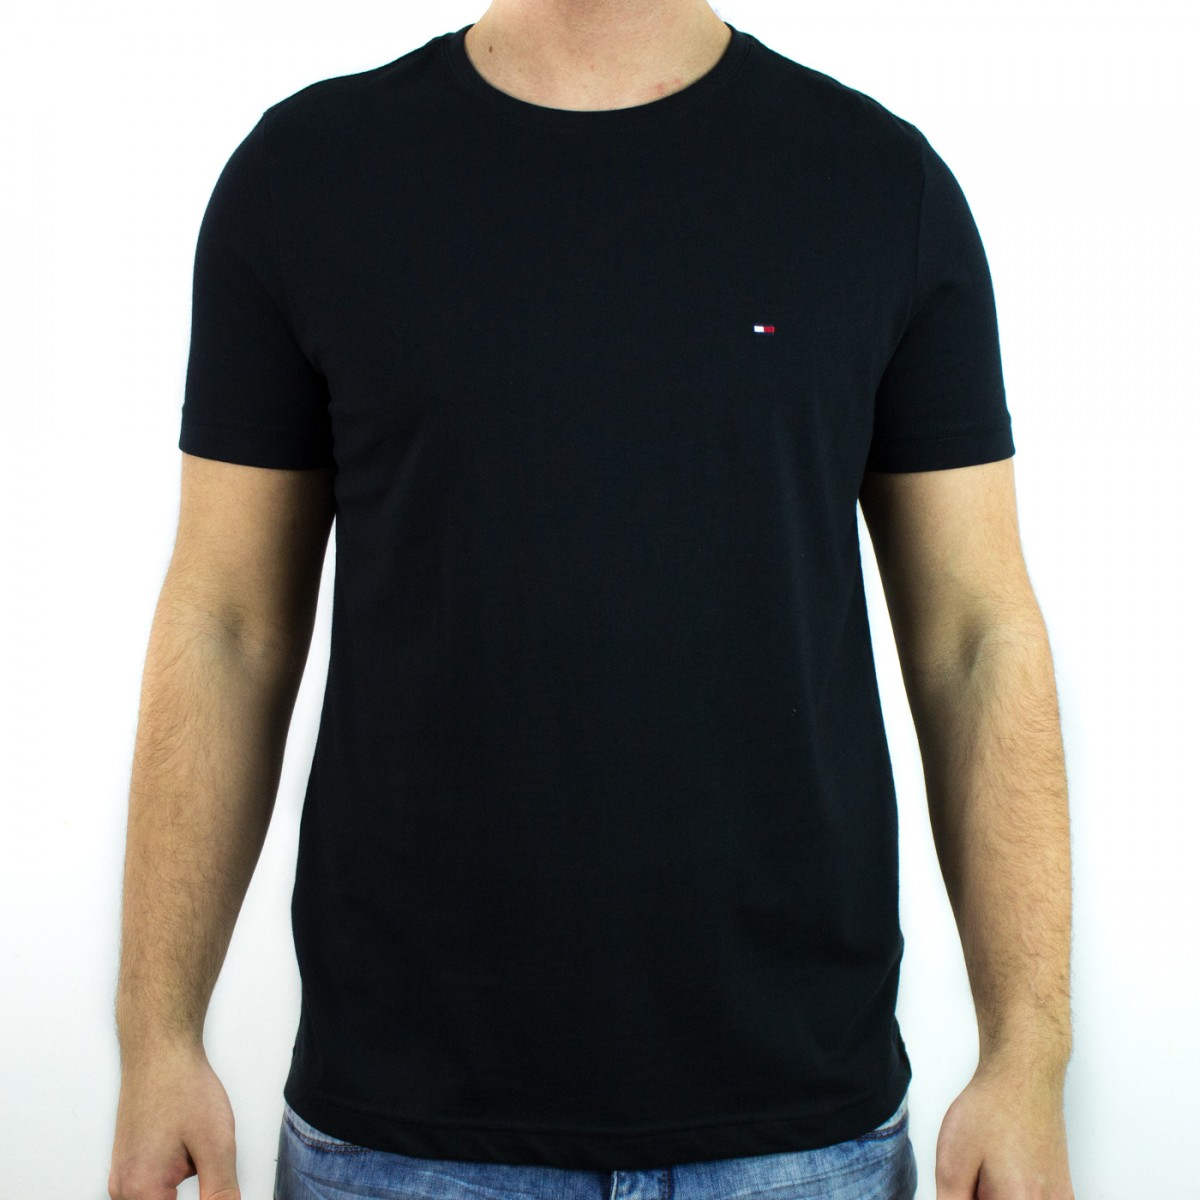 fdff54553af79 Bizz Store - Camiseta Masculina Tommy Hilfiger Manga Curta